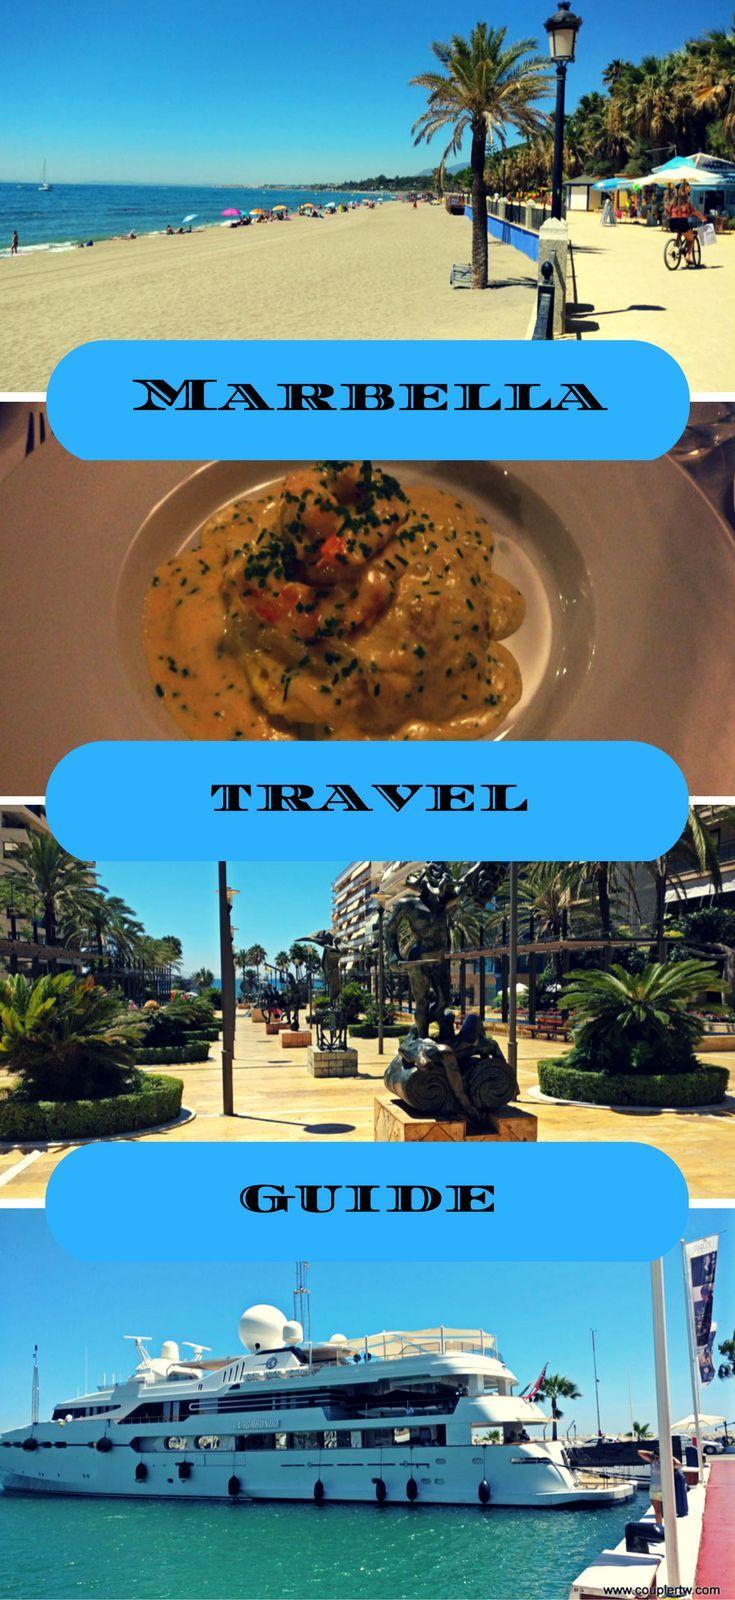 Visit Marbella , Andalusia | Marbella city guide | Marbella travel guide | Best destinations in Spain | Best beaches in Andalusia | What to do in Marbella, Andalusia, Spain | Puerto Banus | Spain top attractions | Spanish riviera | What is Spanish Riviera | Things to do in Spanish Riviera | Beaches in Andalusia | Andalucia